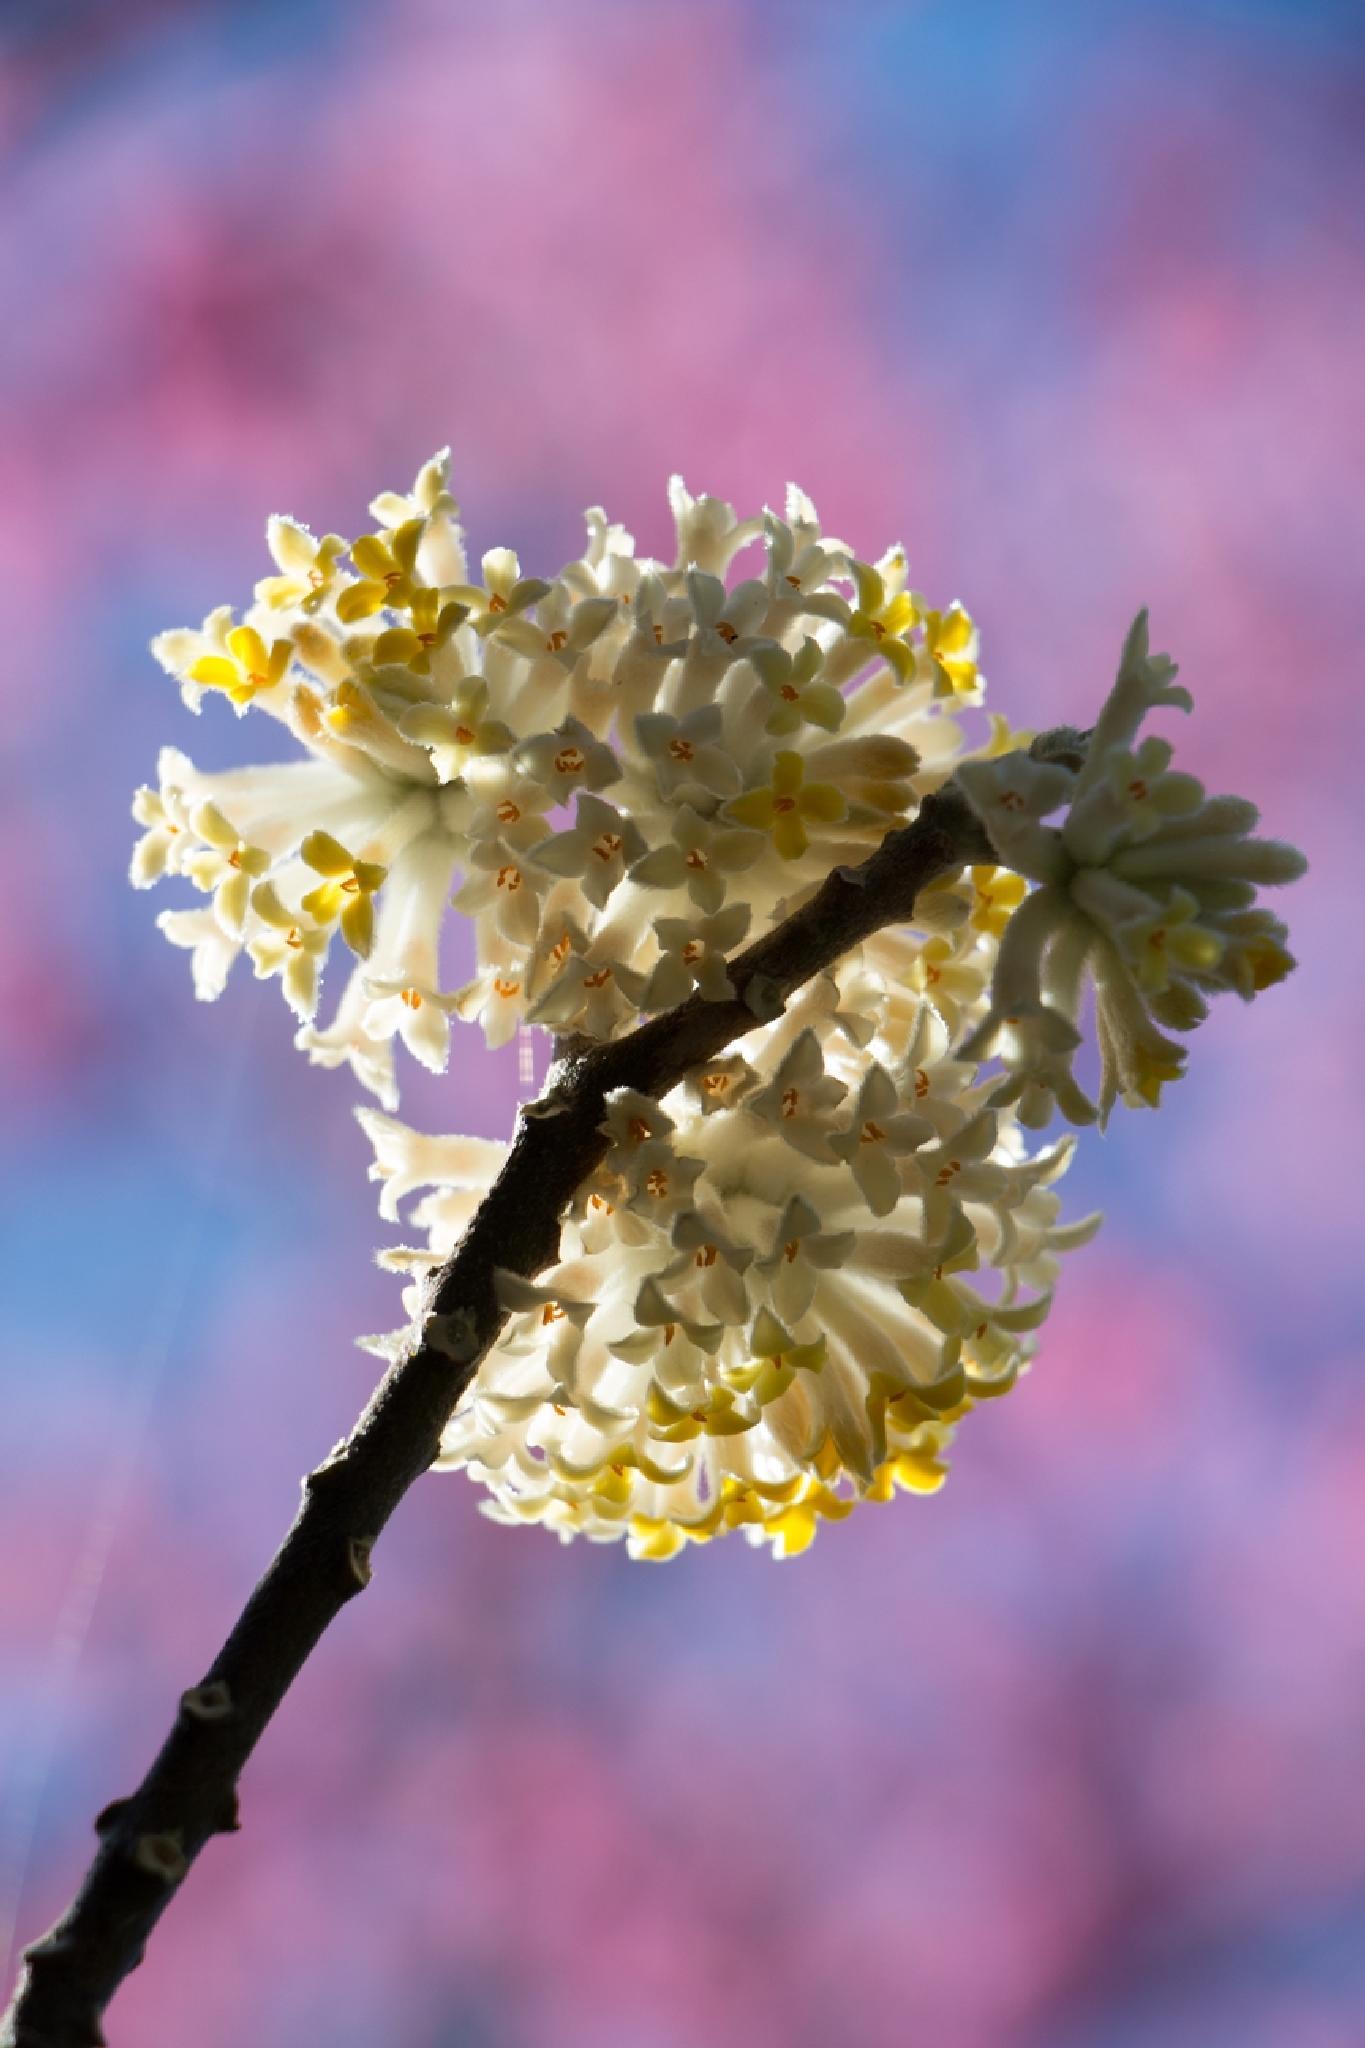 Flower by silvia dz